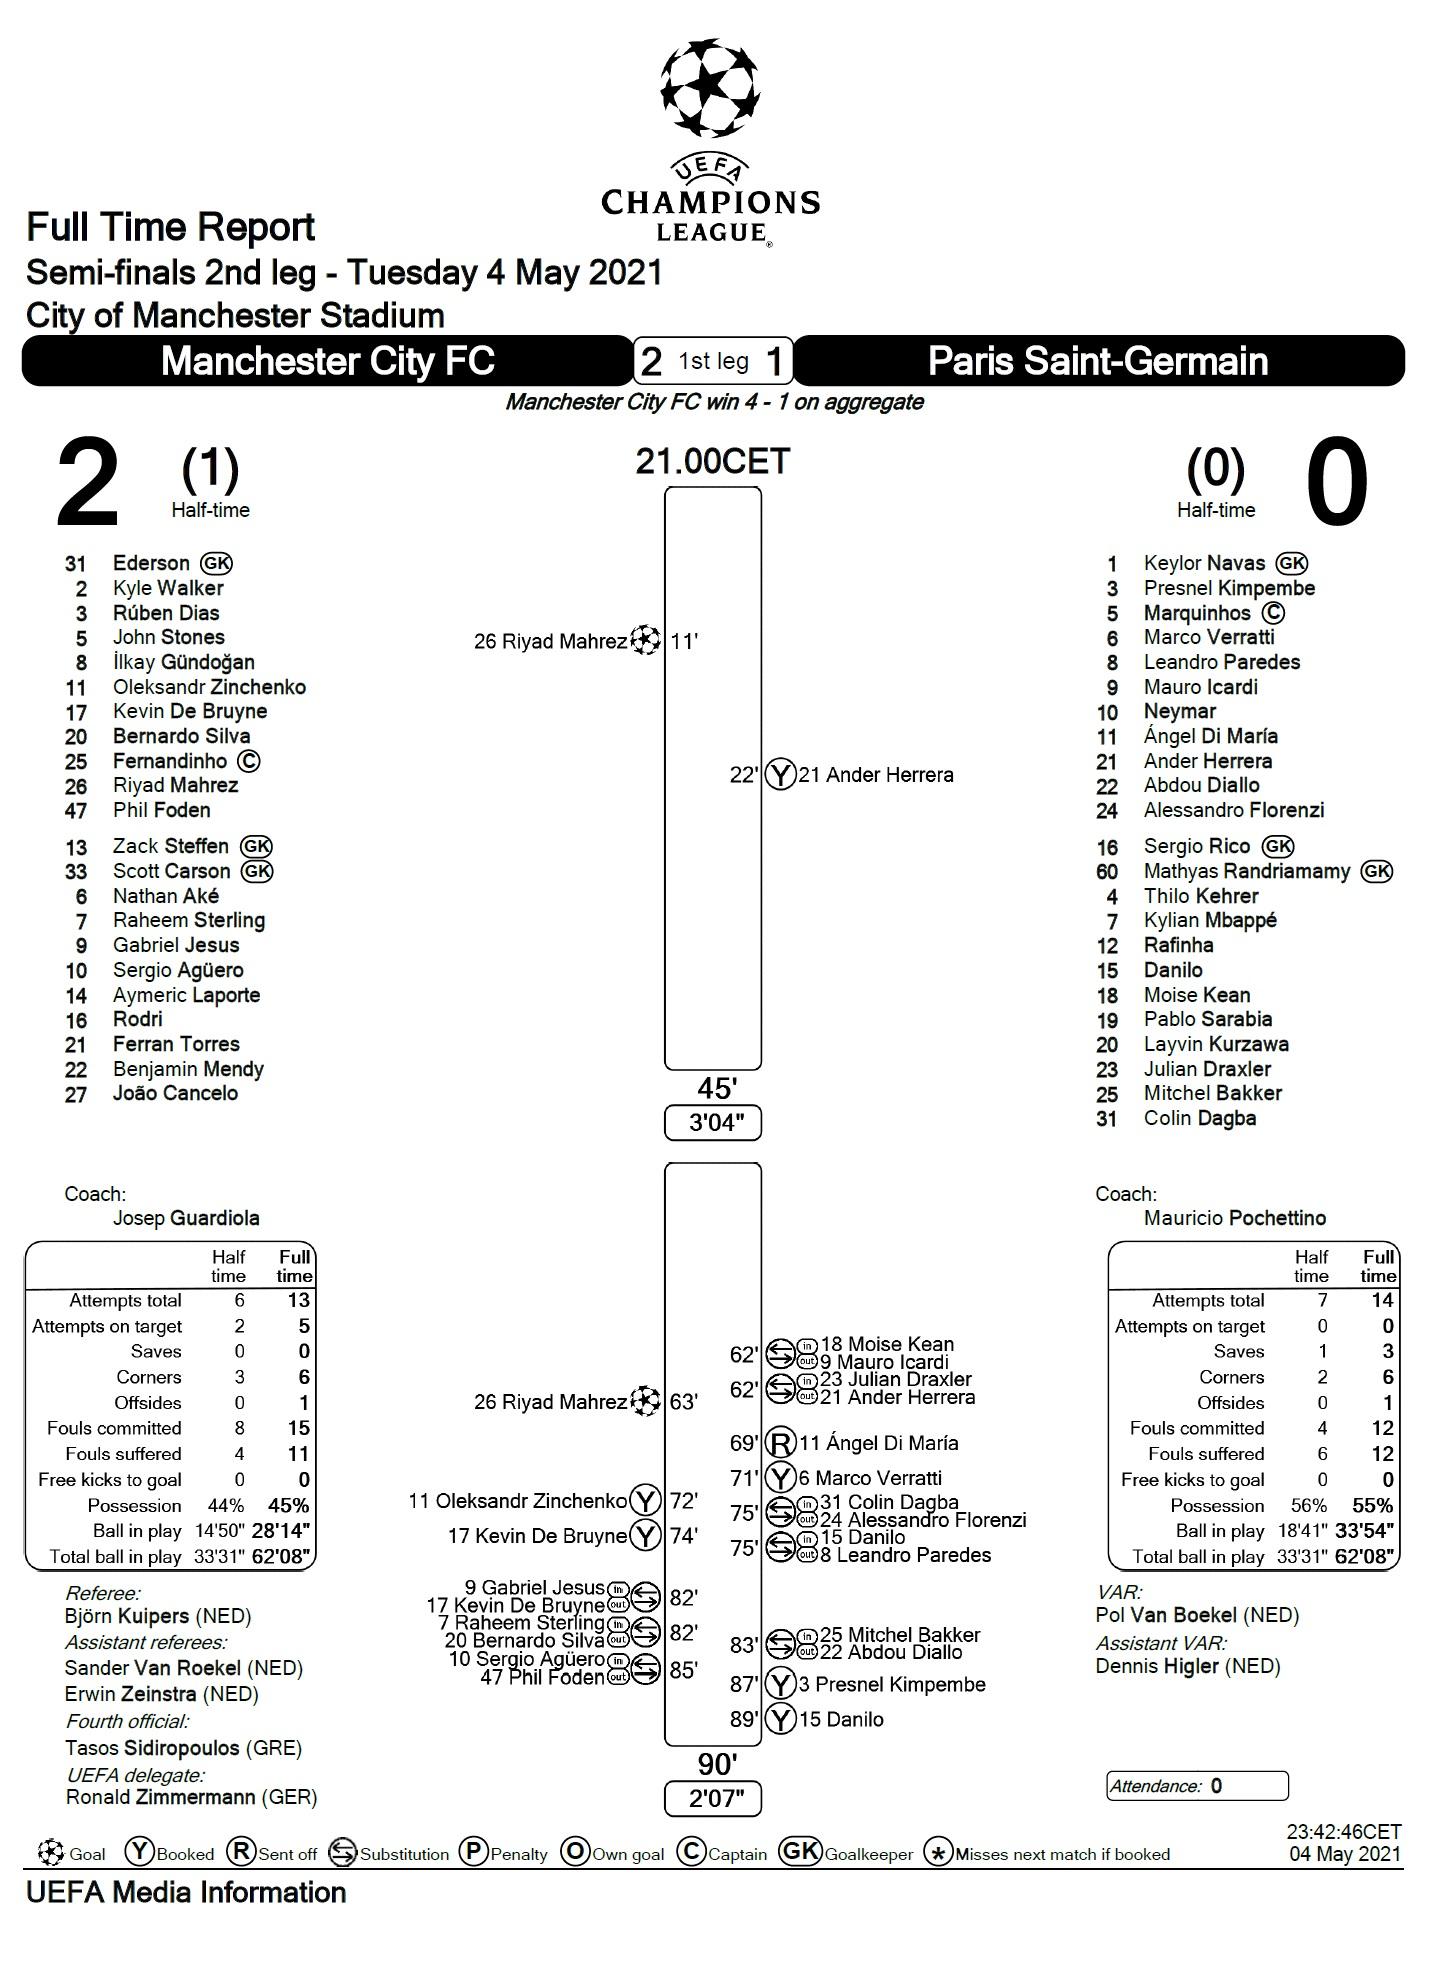 Манчестер Сити (Англия) - ПСЖ (Франция) 2:0